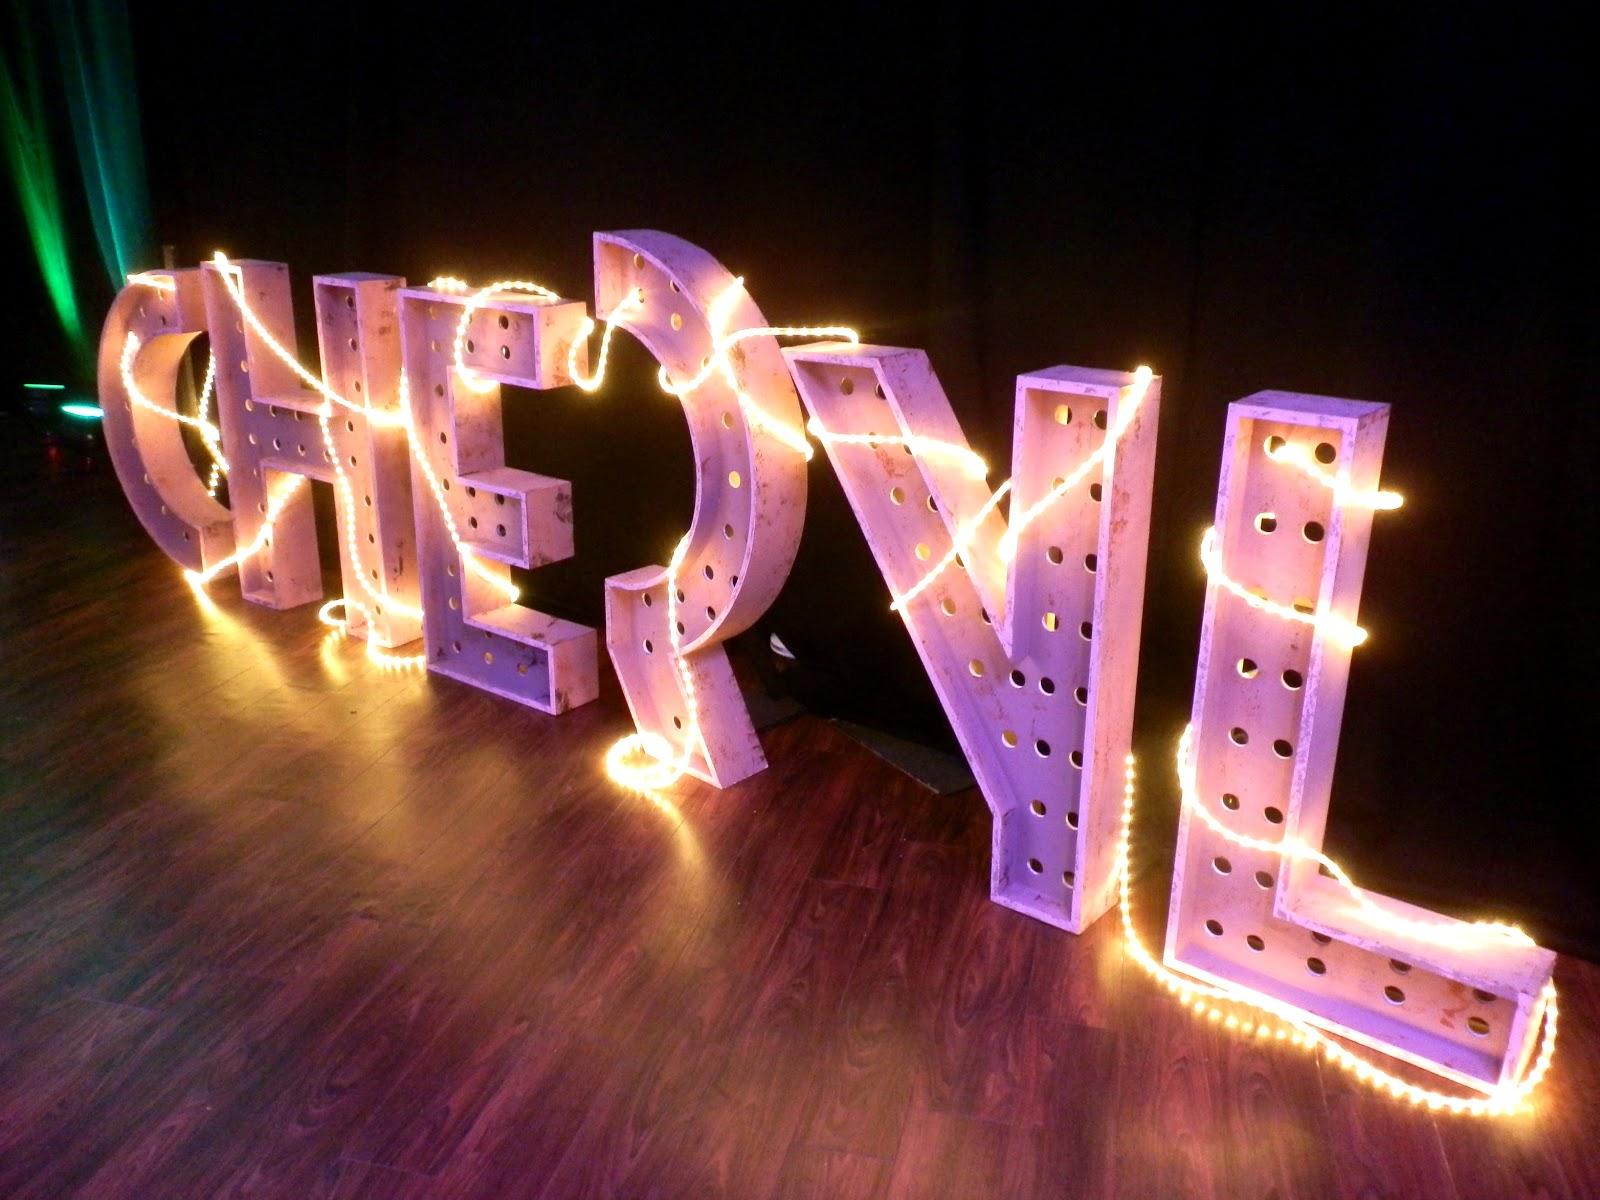 http://2.bp.blogspot.com/-lDH8xCnAj5U/UHsxAfiGK7I/AAAAAAAAIFA/41RNLE8P1xw/s1600/cheryl+cole+a+million+lights+tour.jpg